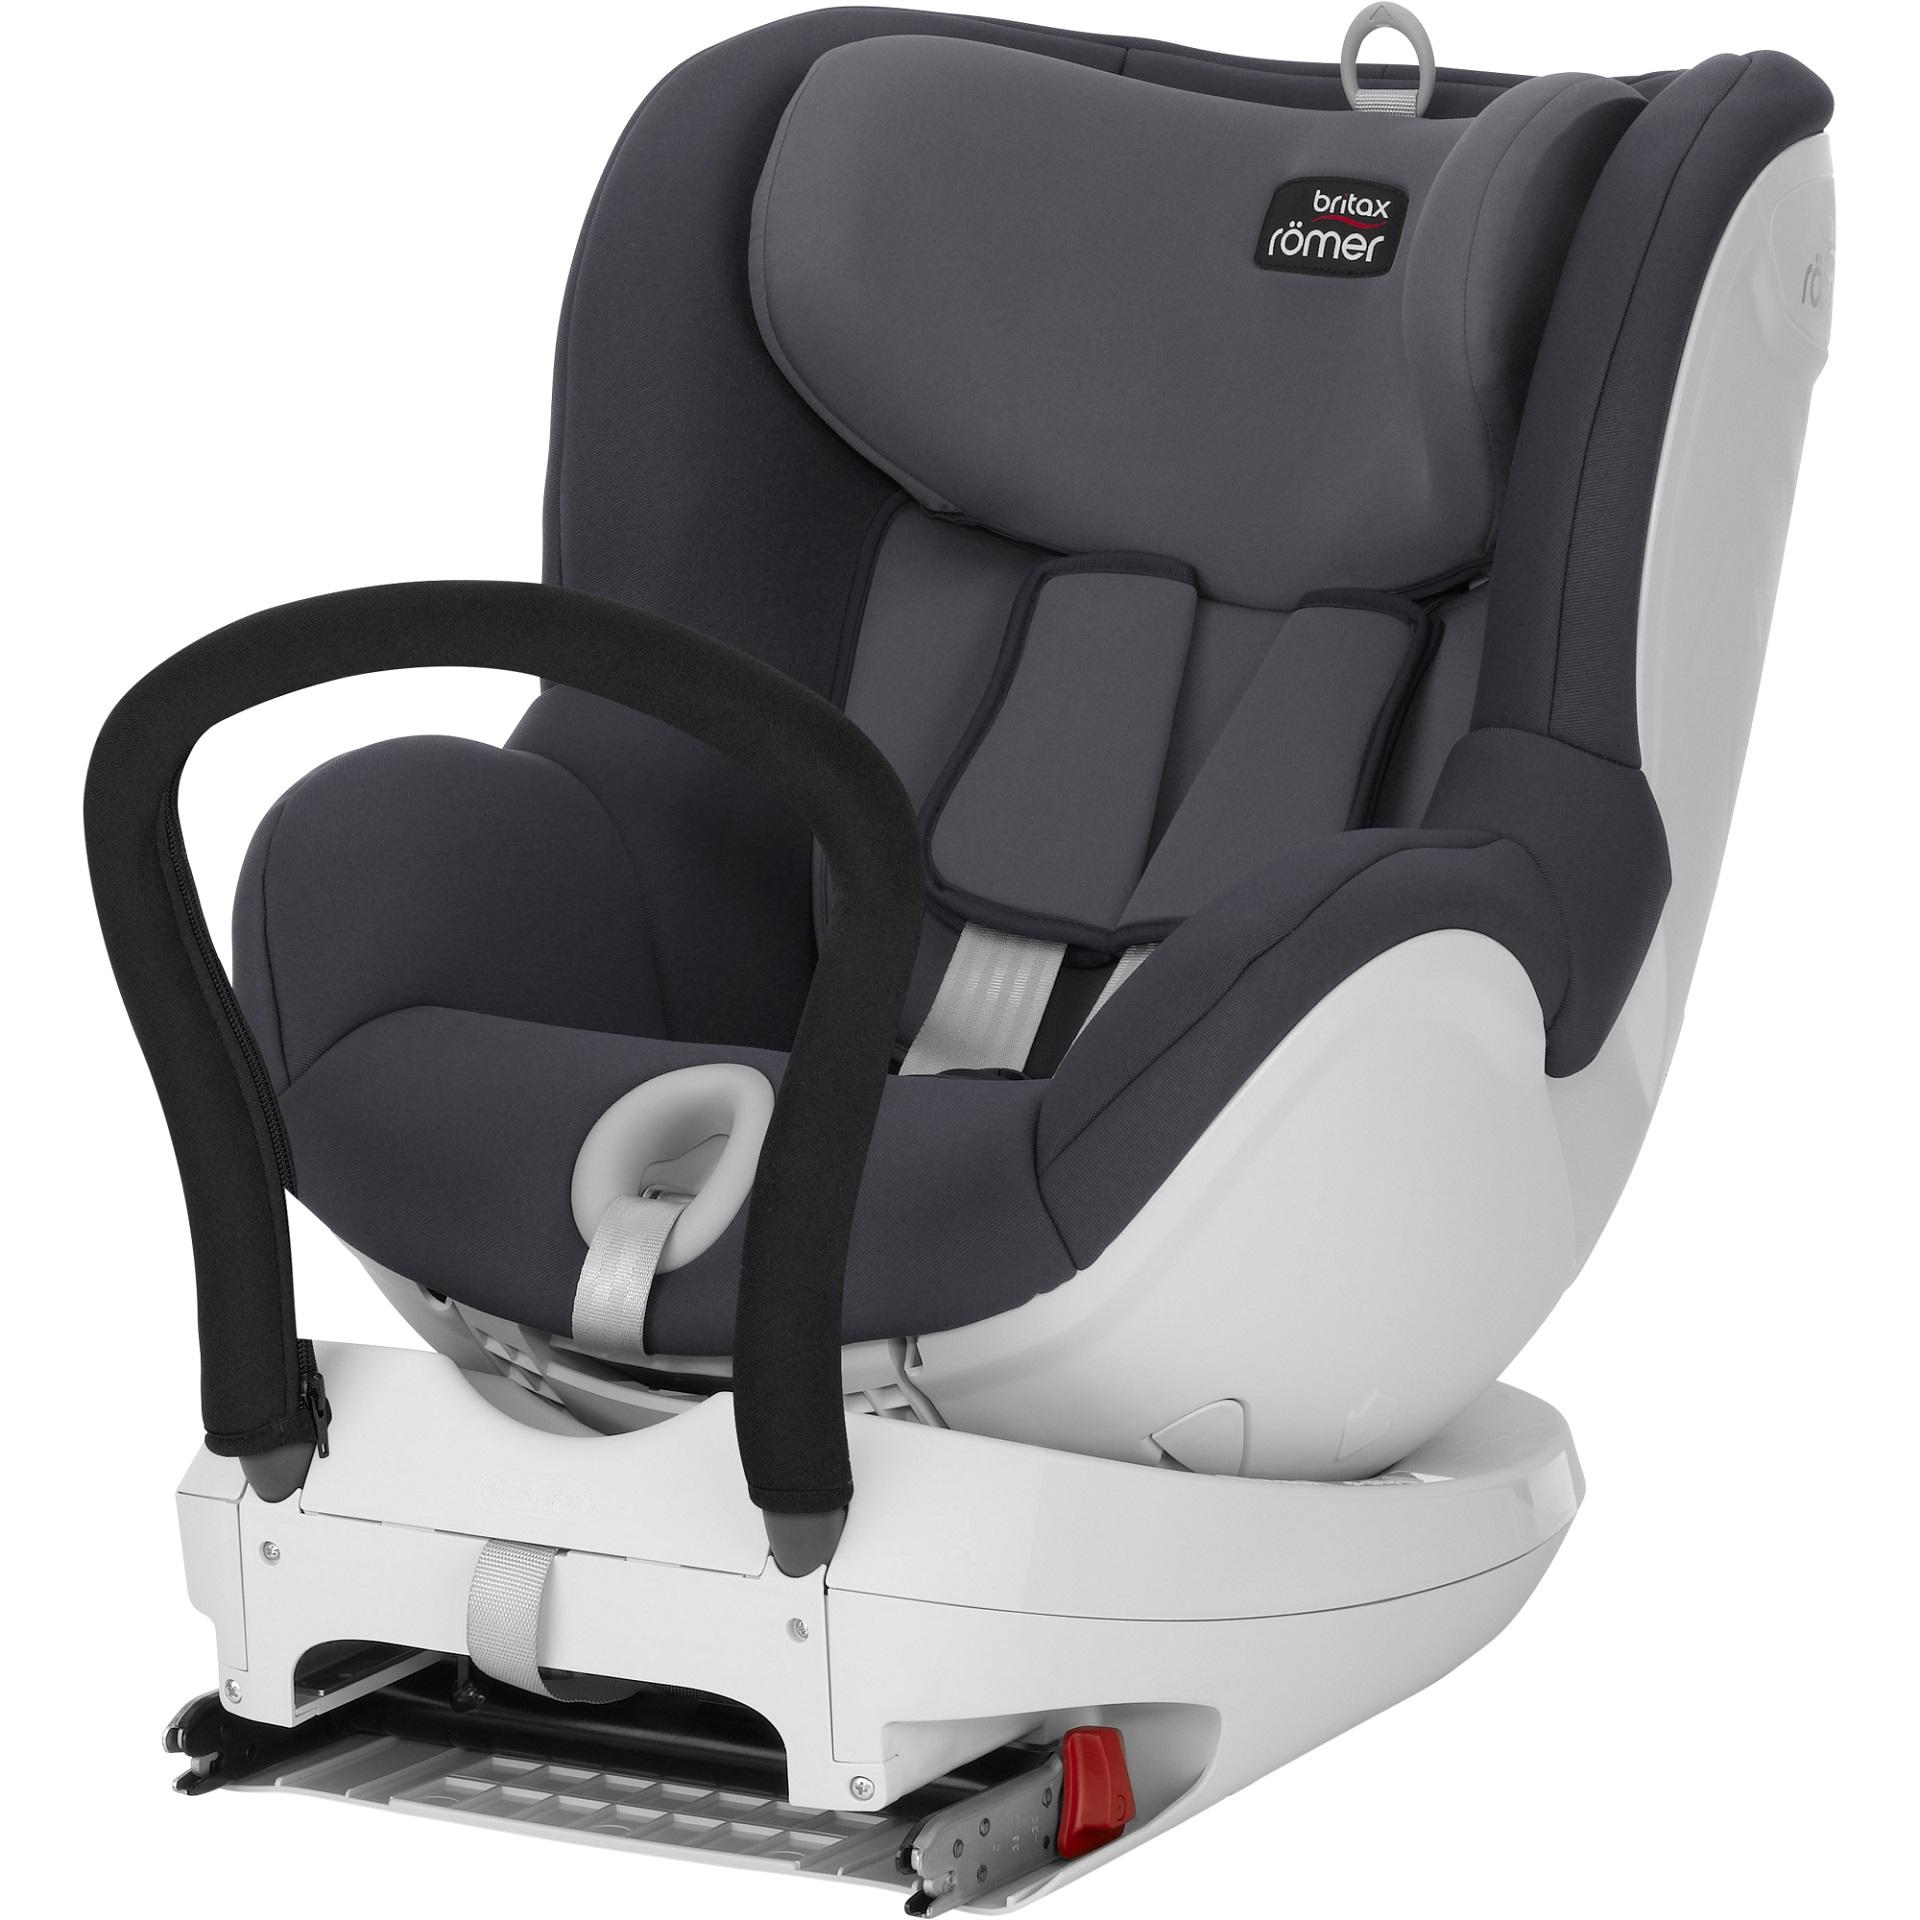 Britax Romer Car Seat Dualfix Storm Grey 2019 Large Image 1